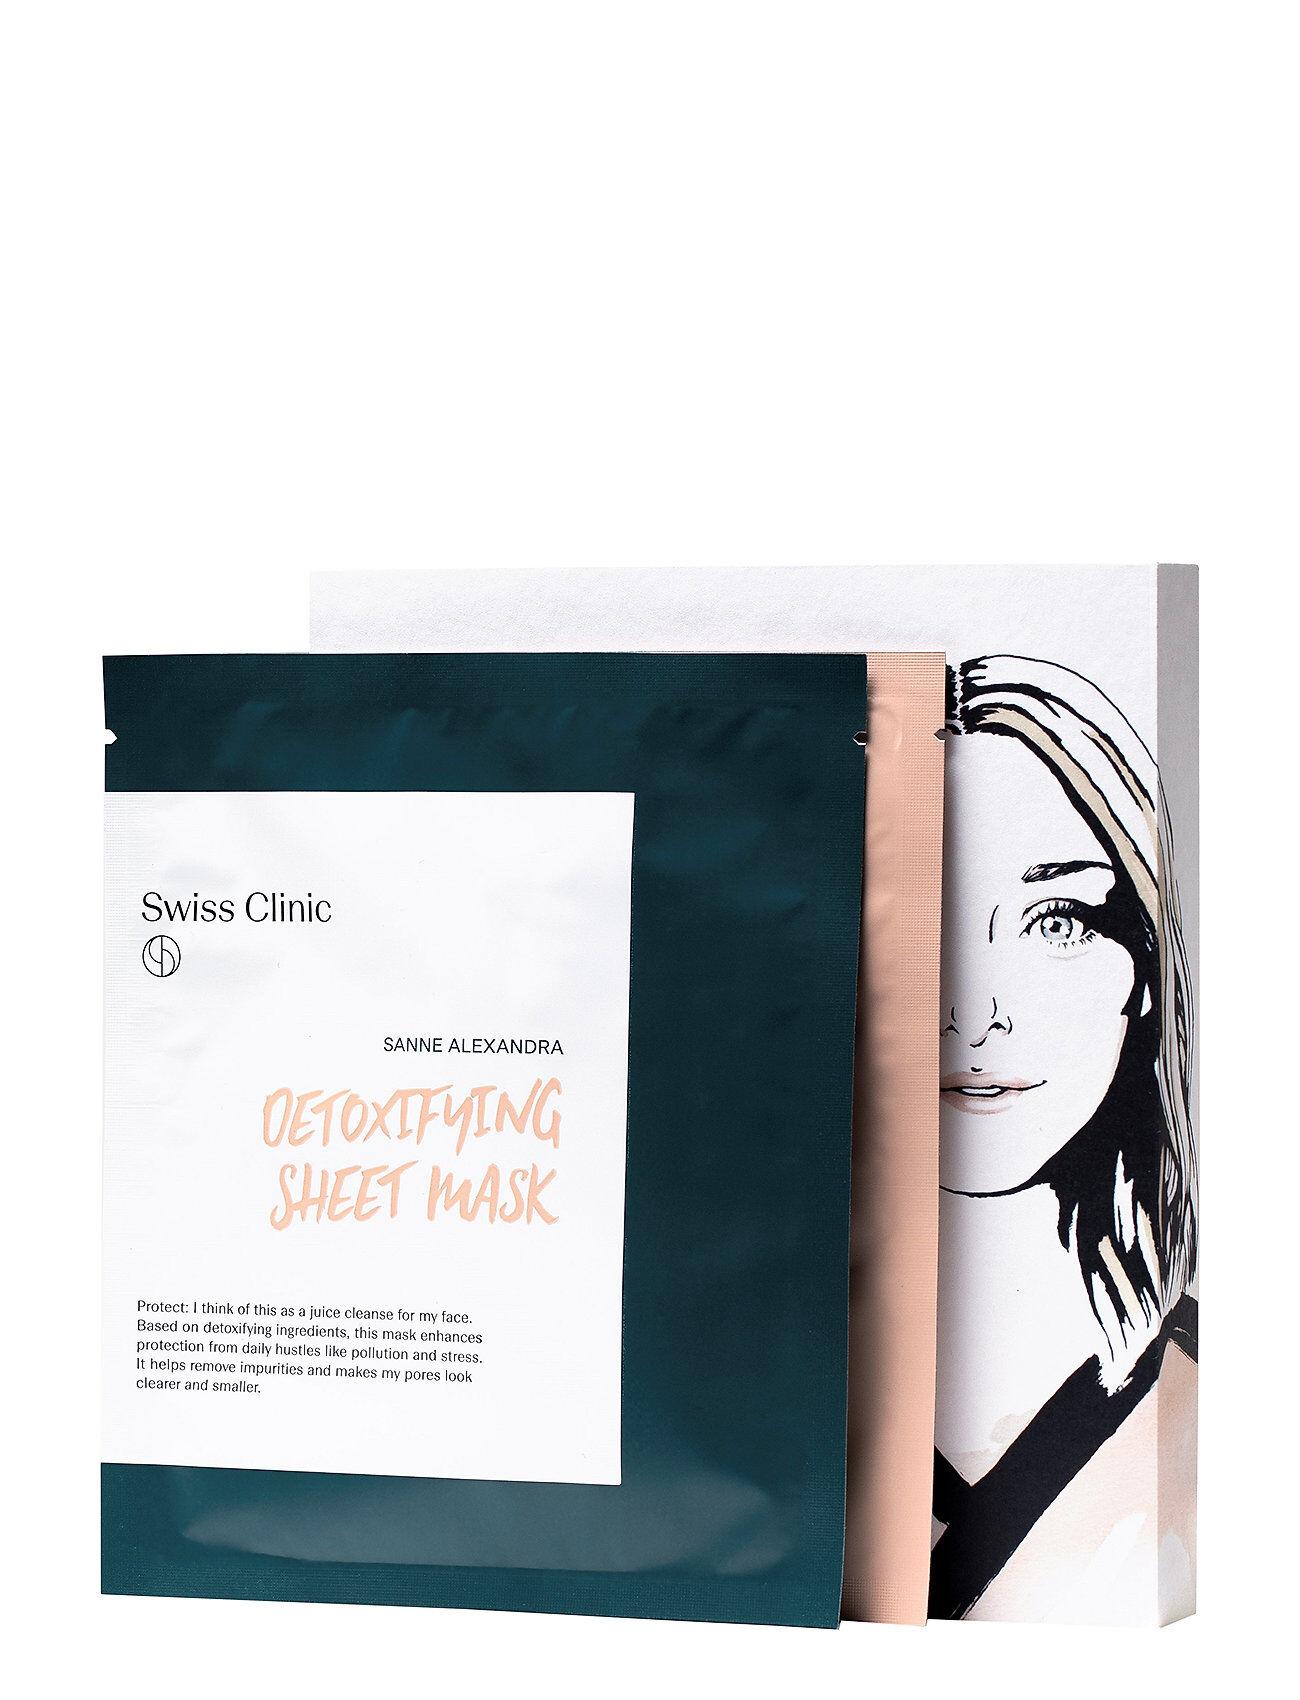 Swiss Clinic Detox & Glam Treatment Beauty WOMEN Skin Care Face Sheet Mask Nude Swiss Clinic